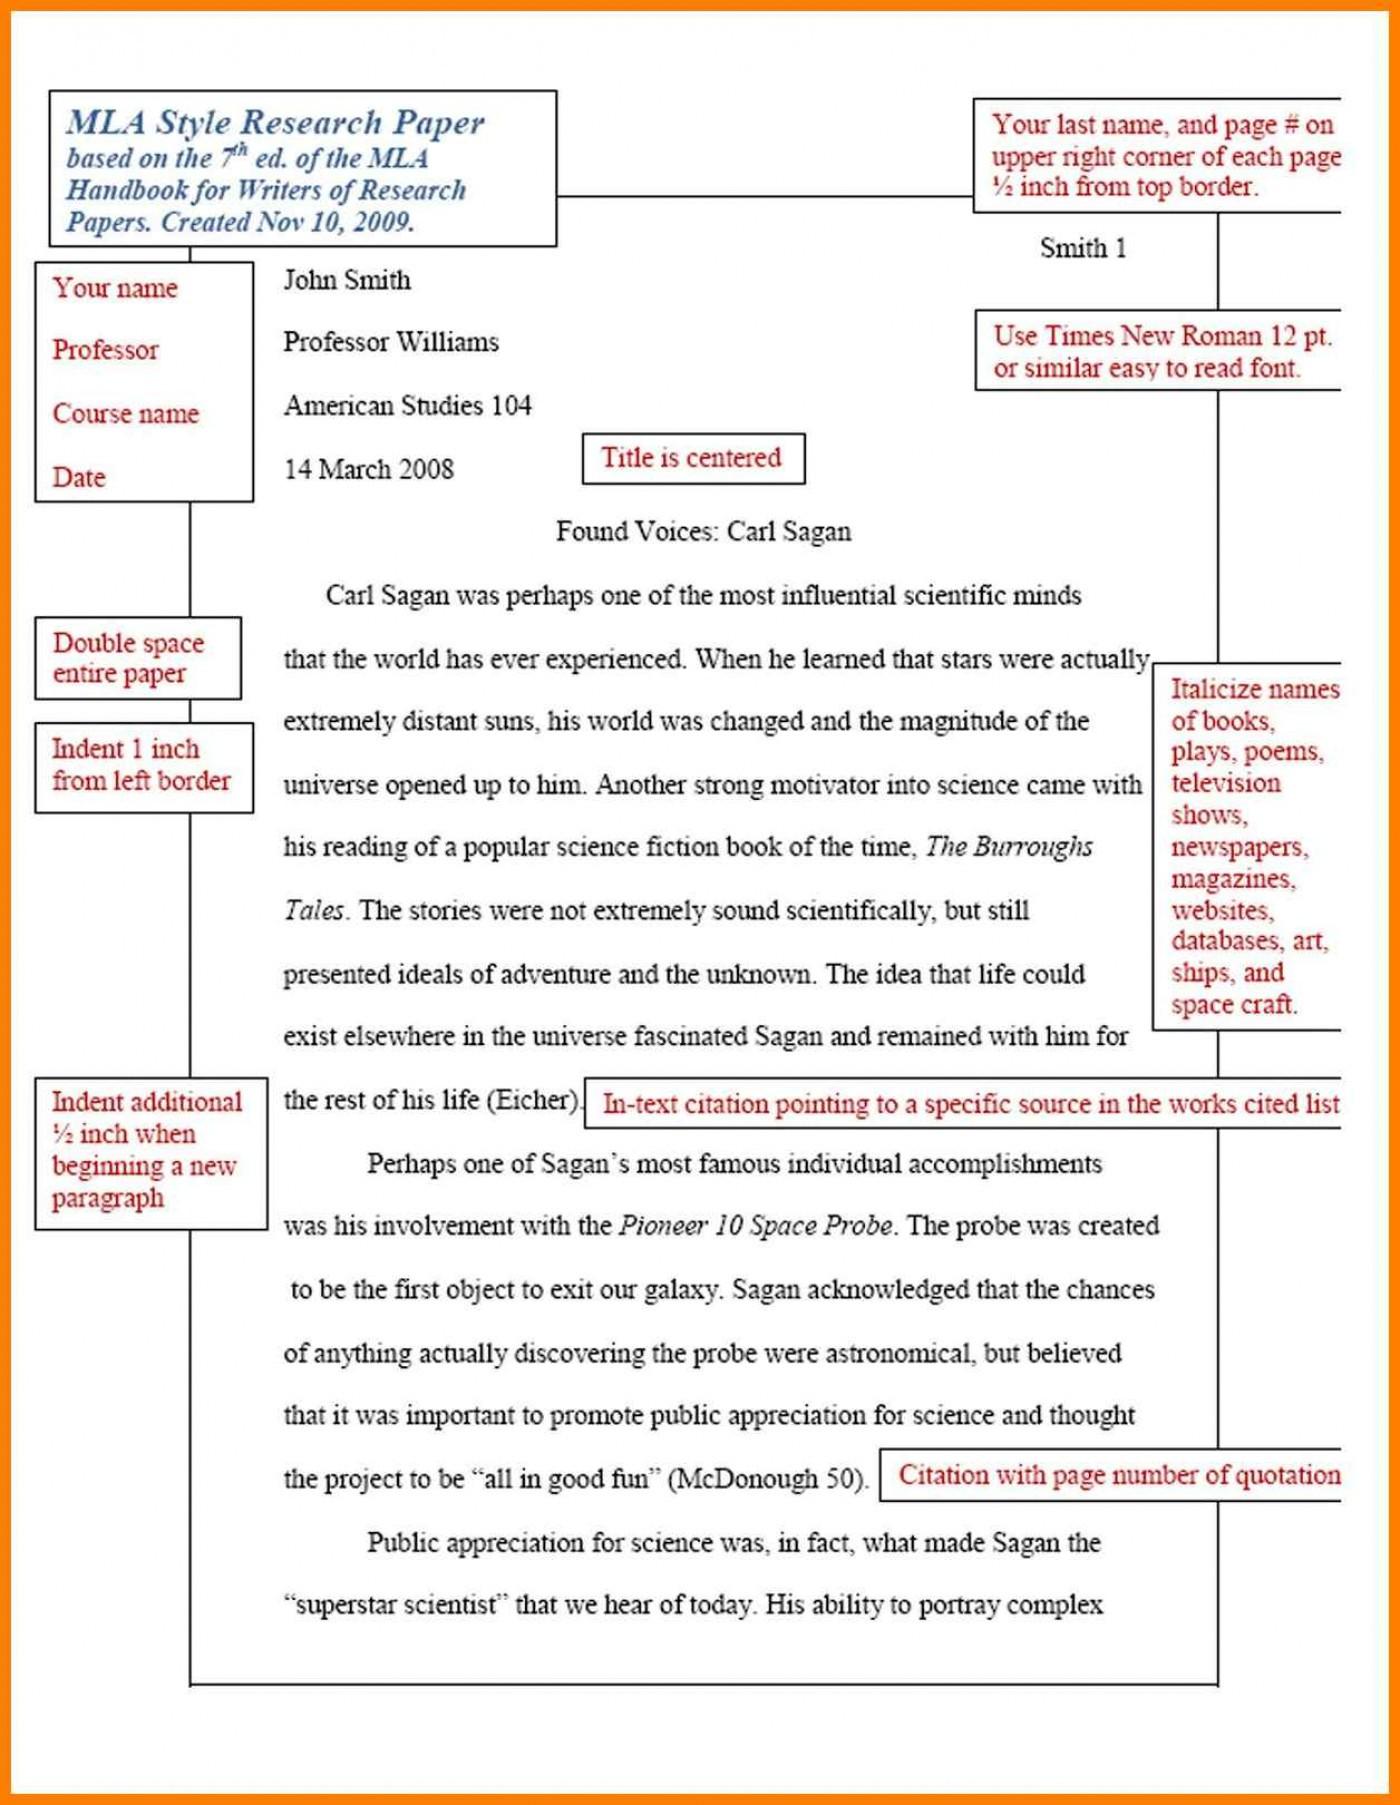 Mla Citation Practice Worksheet 012 Mla In Text Citation Practice Worksheet Research Paper